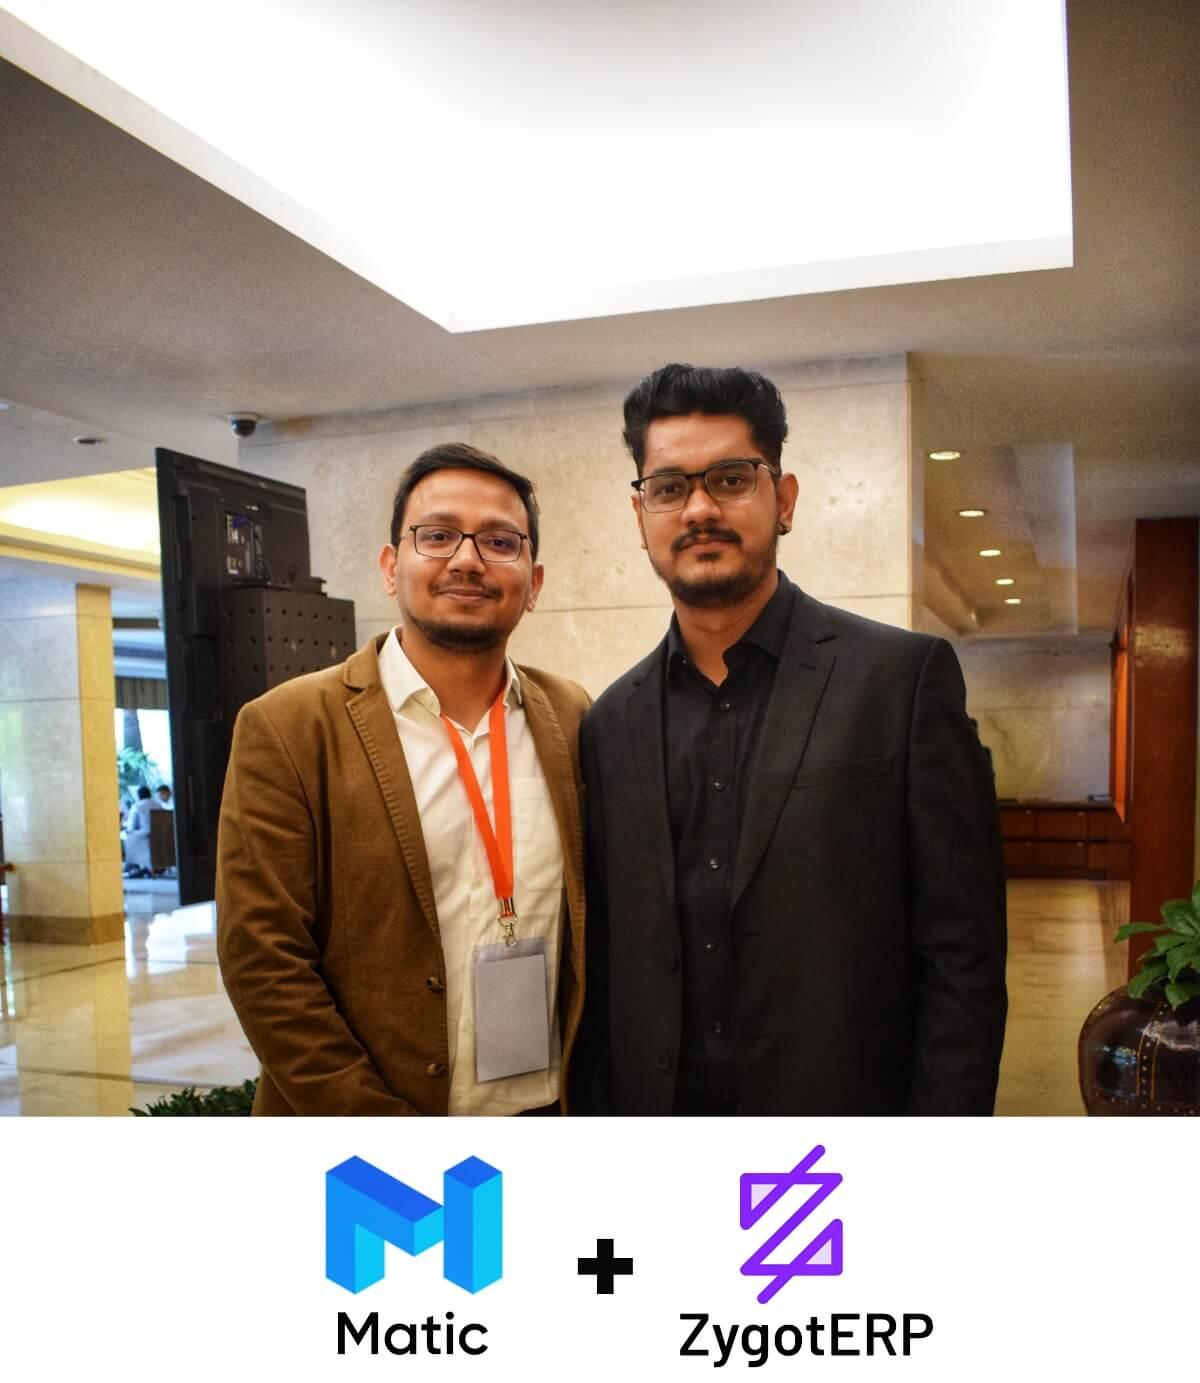 [In Frame (From Left) Sandeep Nailwal, COO, Matic Network, and Pankaj Kurumkar, CMO from ZygotERP]